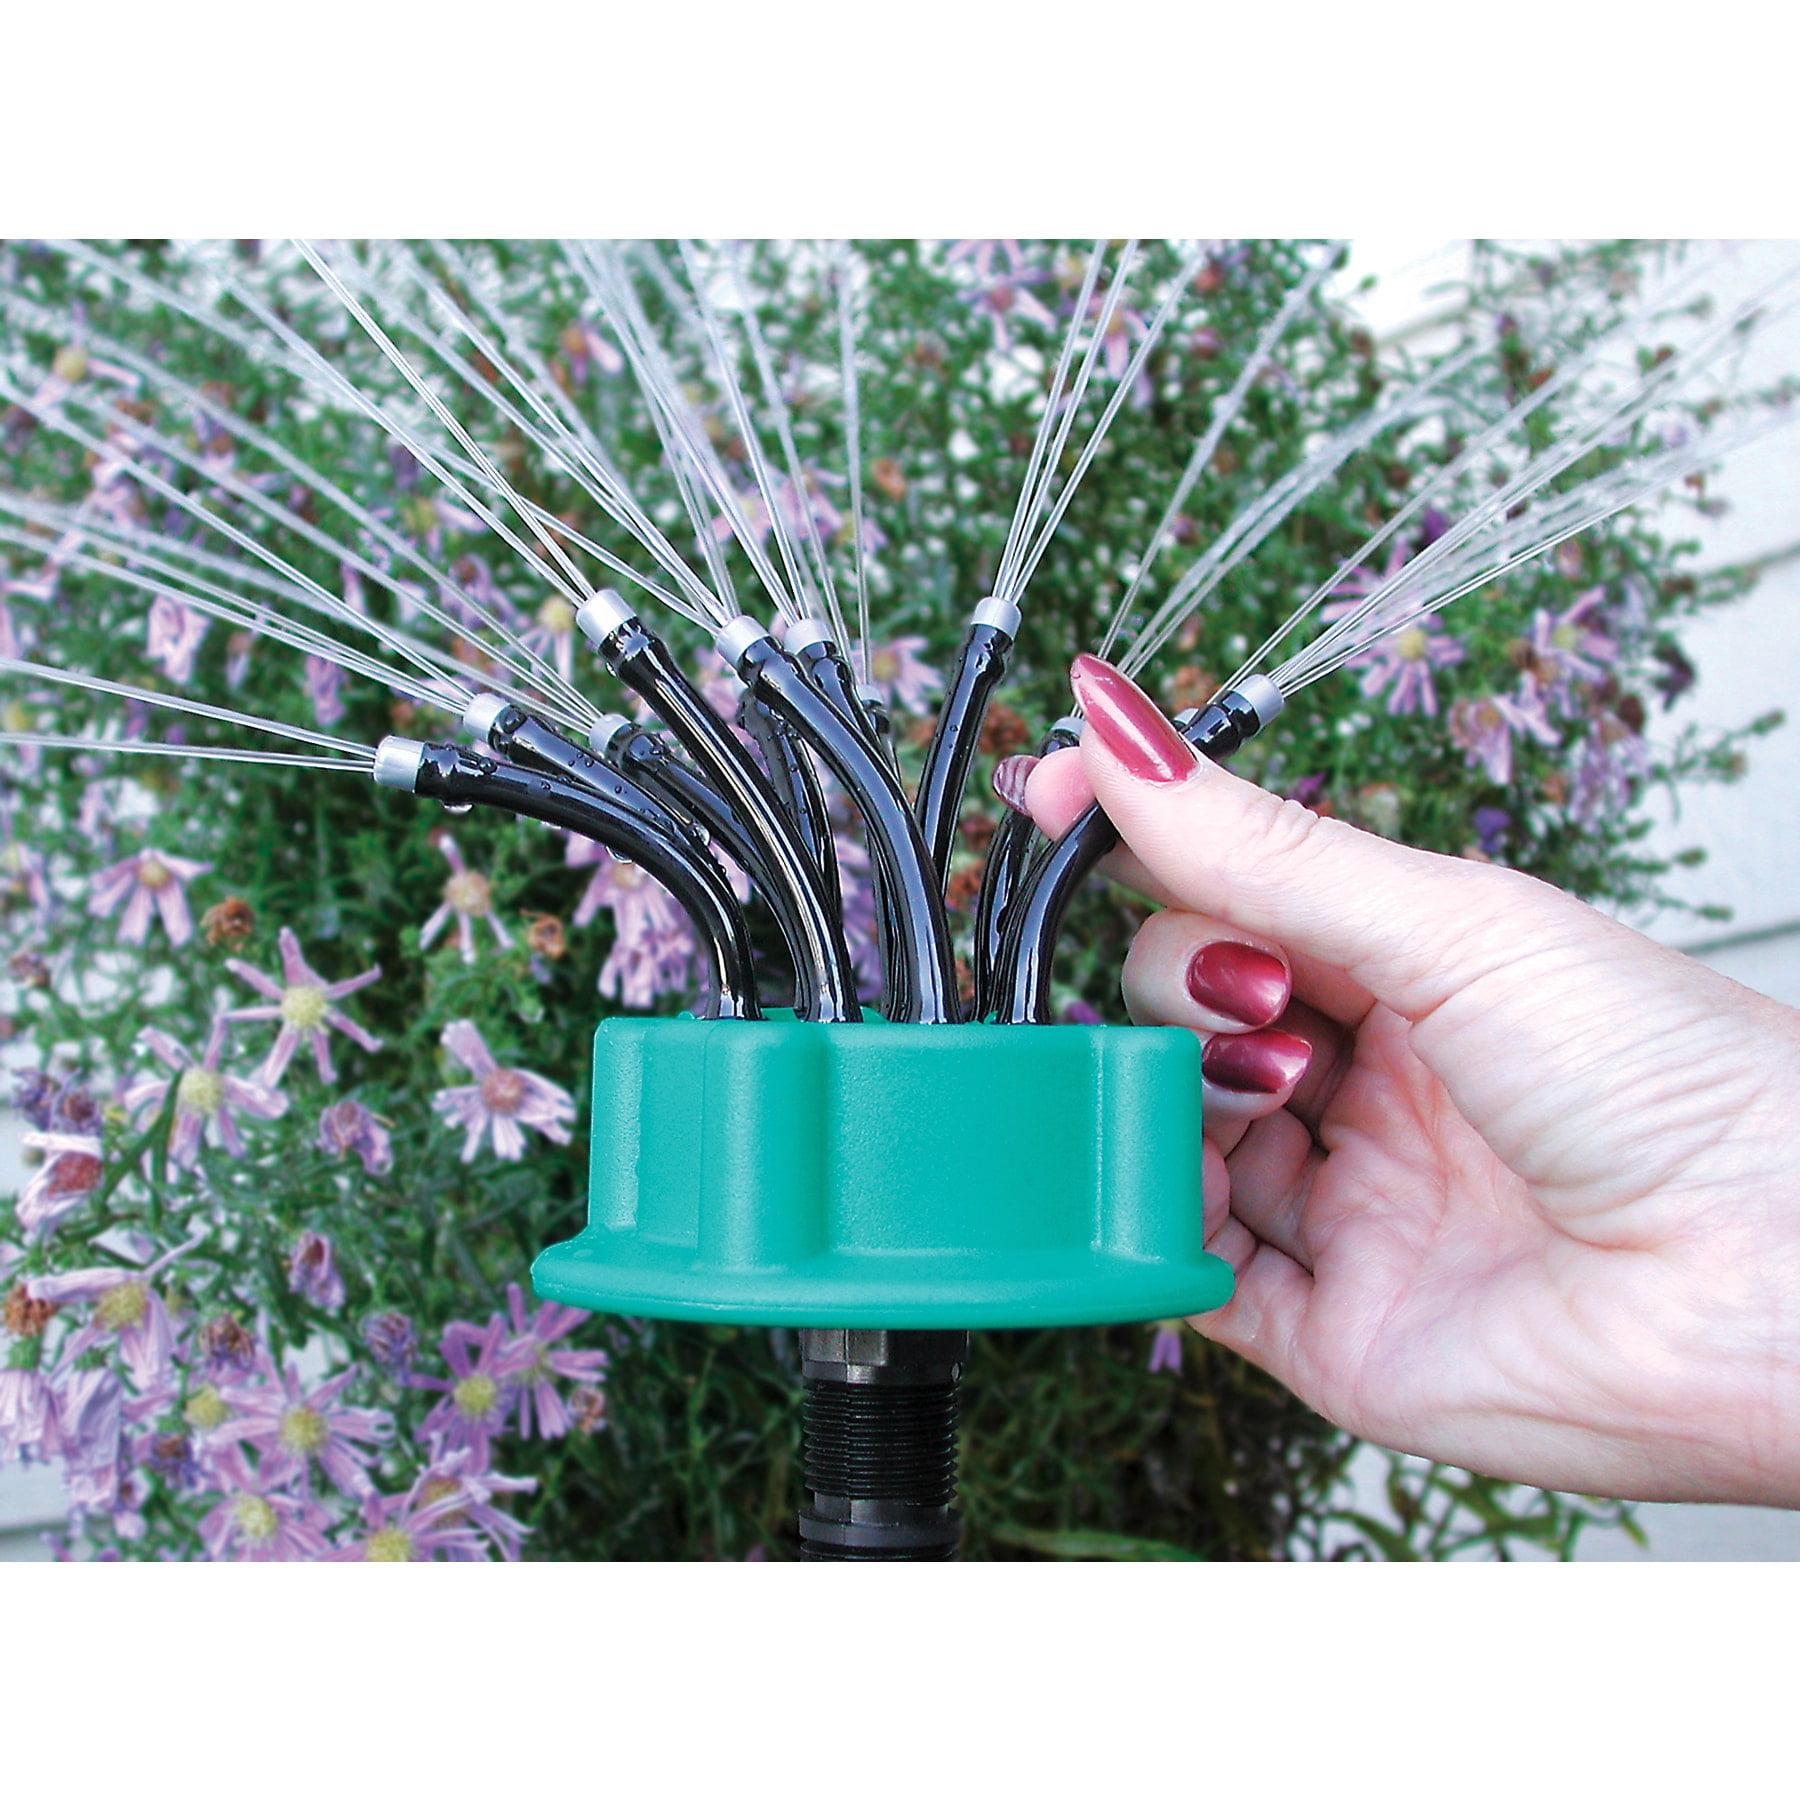 Noodlehead Flexible Lawn and Garden Sprinkler Walmart